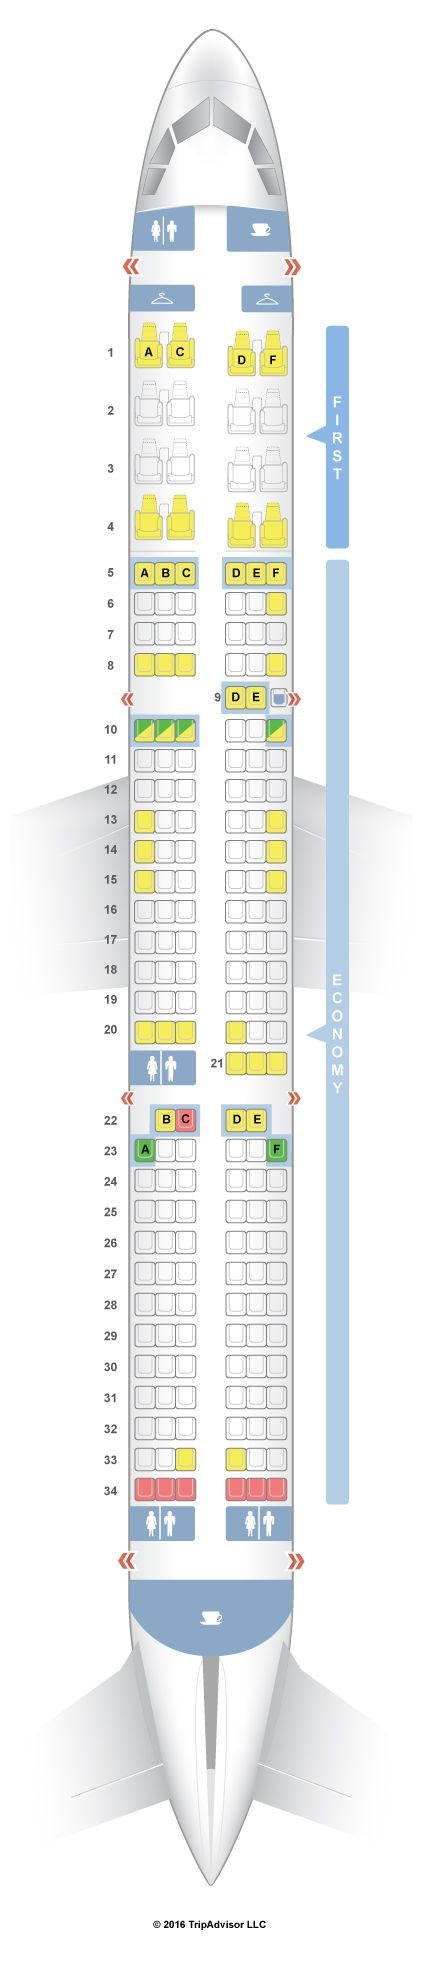 SeatGuru Seat Map American Airlines Airbus A321 (321) V3